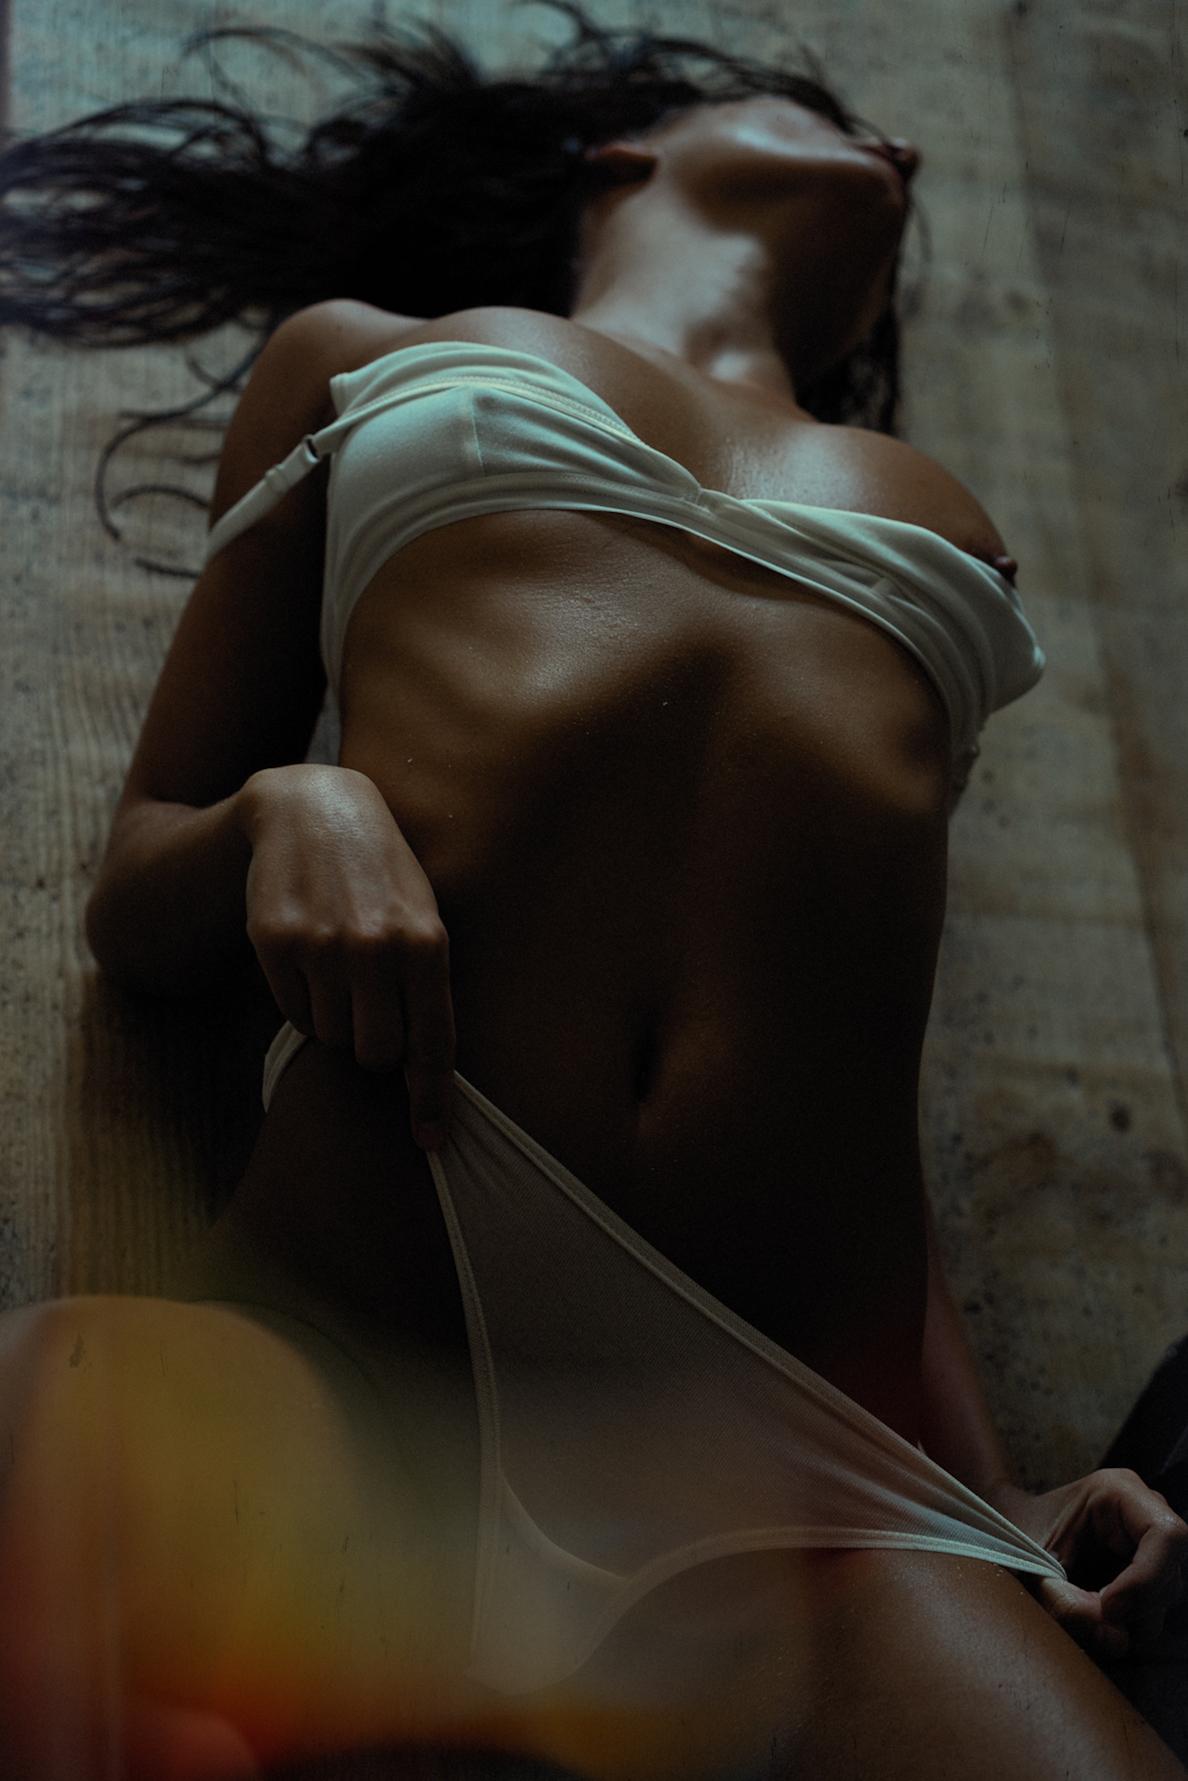 Sideboobs Normani nudes (31 photos) Topless, Twitter, legs